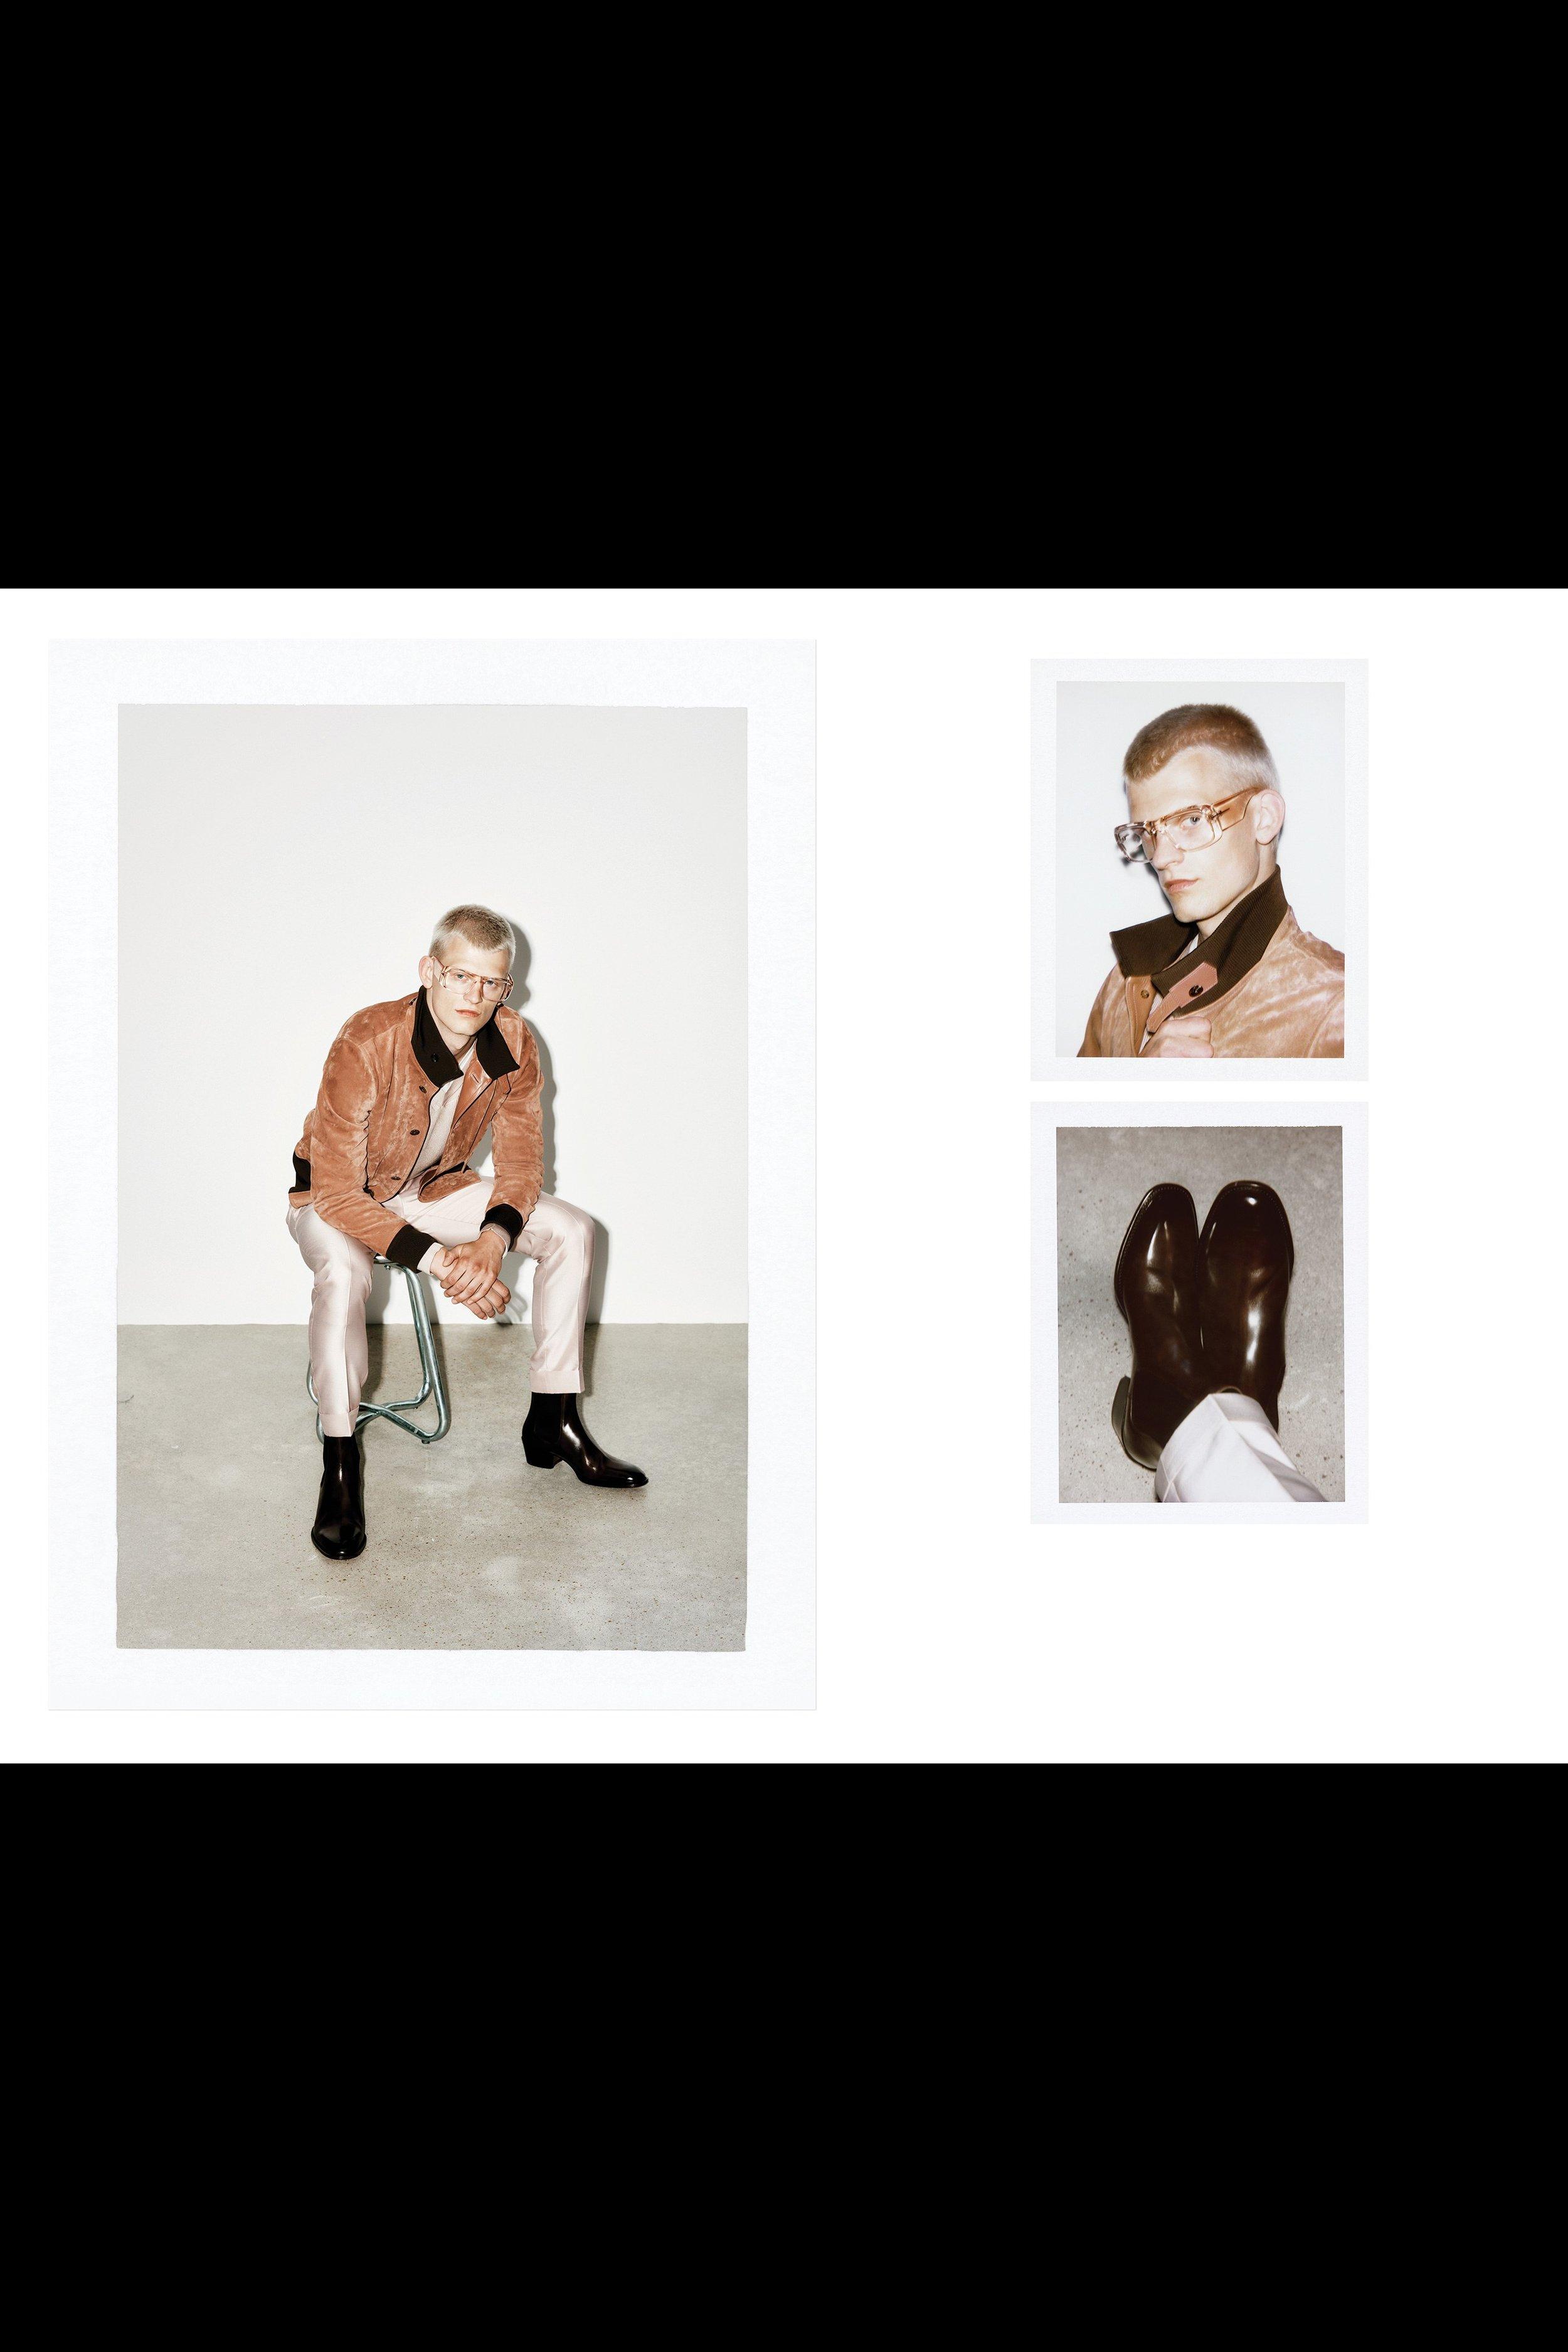 00030-Tom-Ford-vogue-menswear-spring-2019-pr.jpg